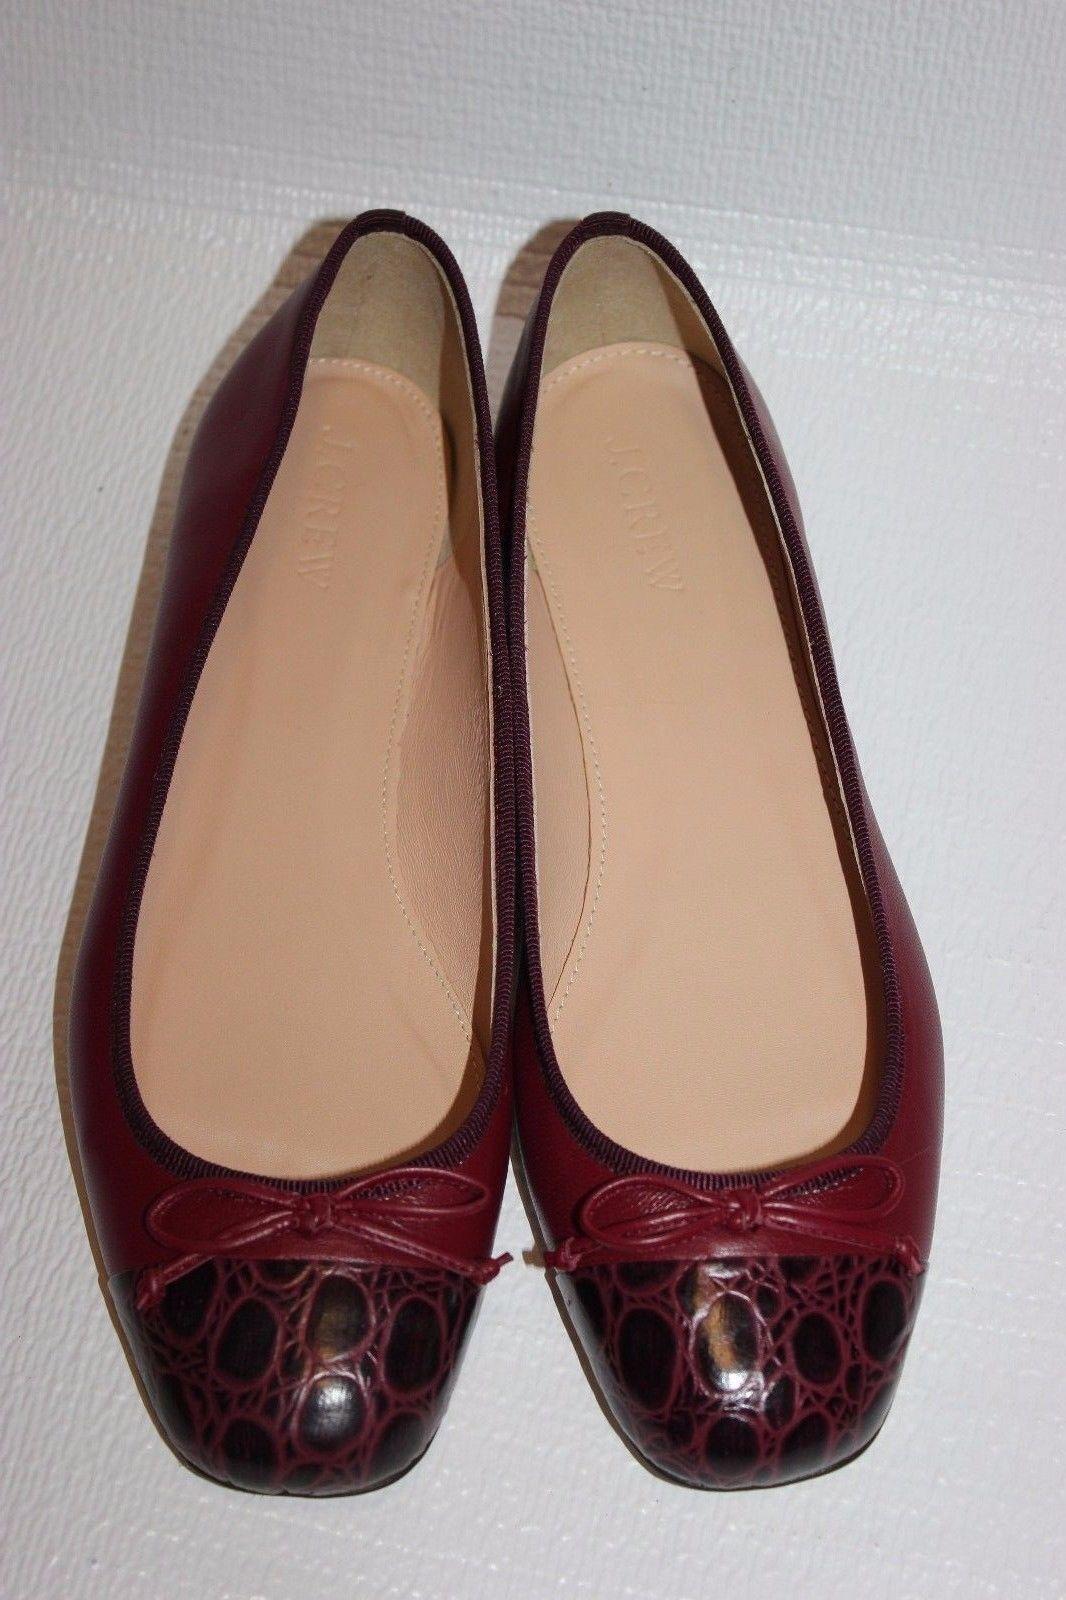 NEW JCrew  138 Lily Cap-Toe Ballet Flats Sz 7 7 7 Vivid Burgundy shoes G7843 2dc1f6